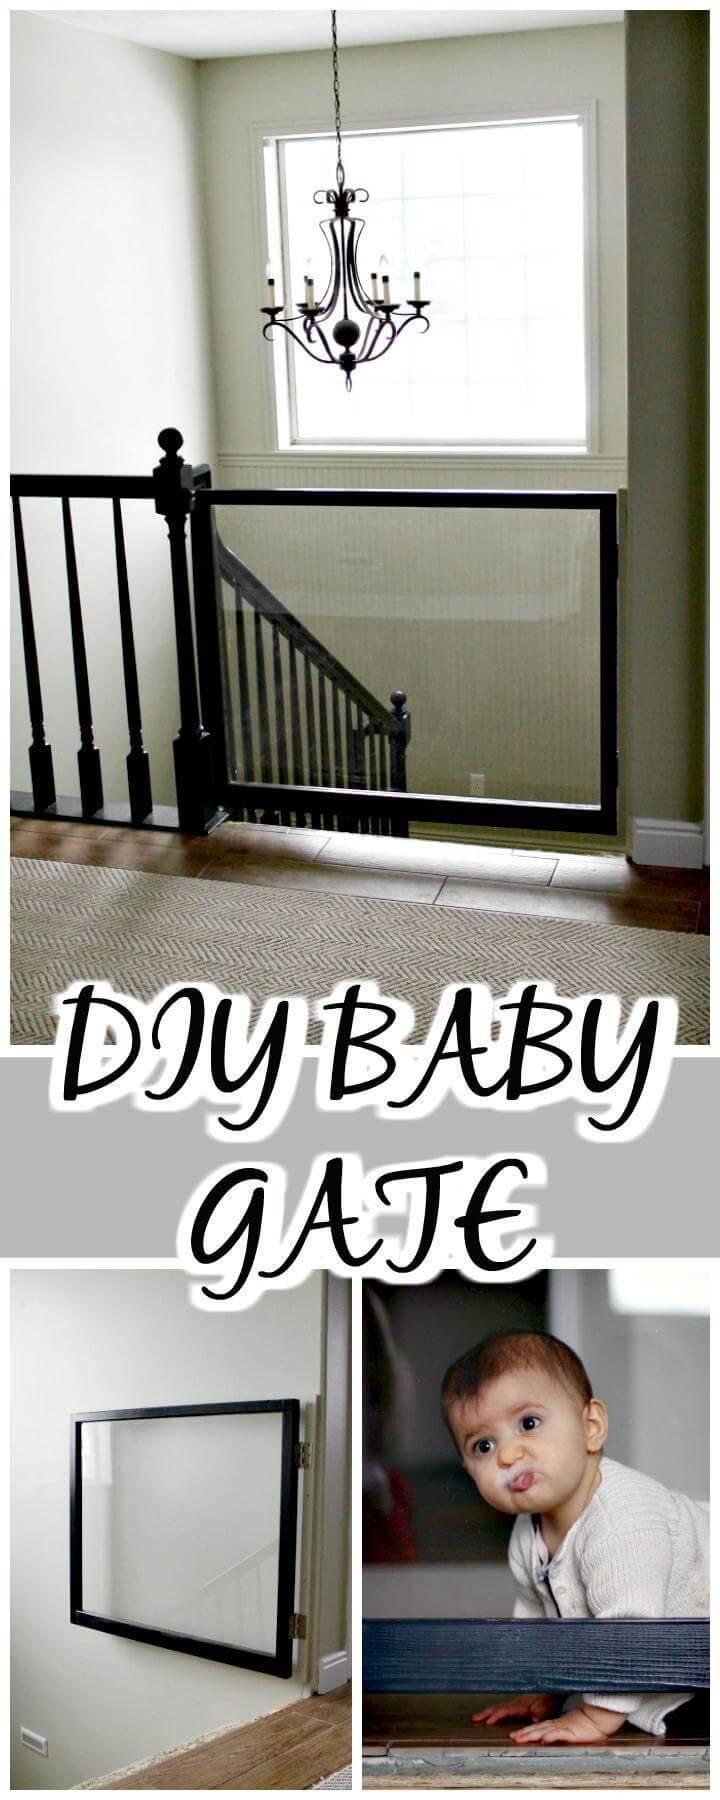 DIY handmade baby gate